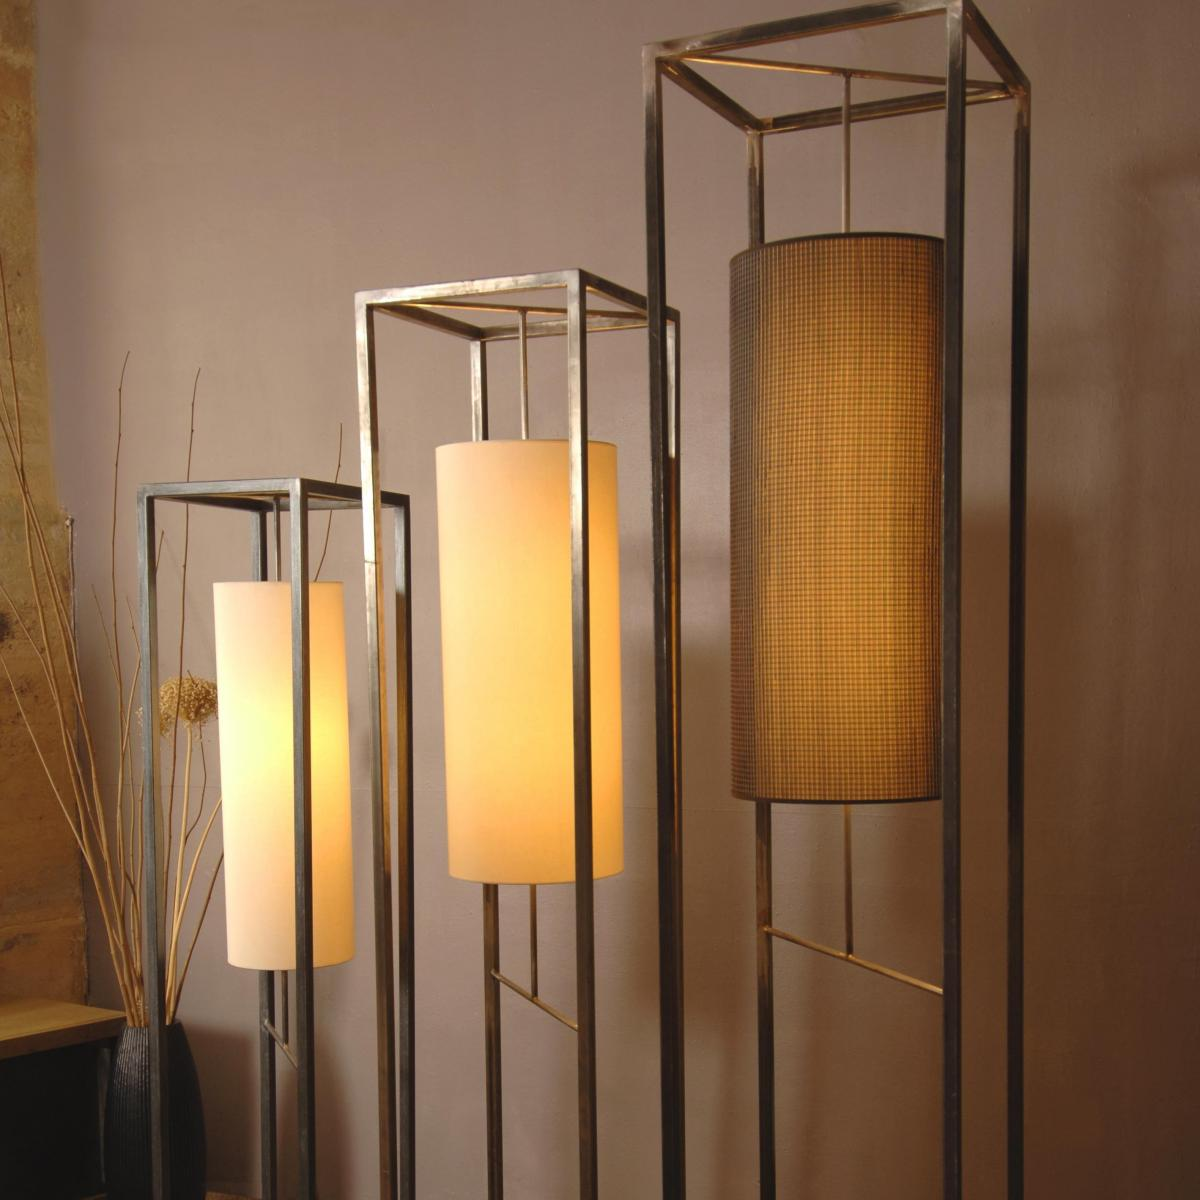 Structure de lampadaire en acier<br>